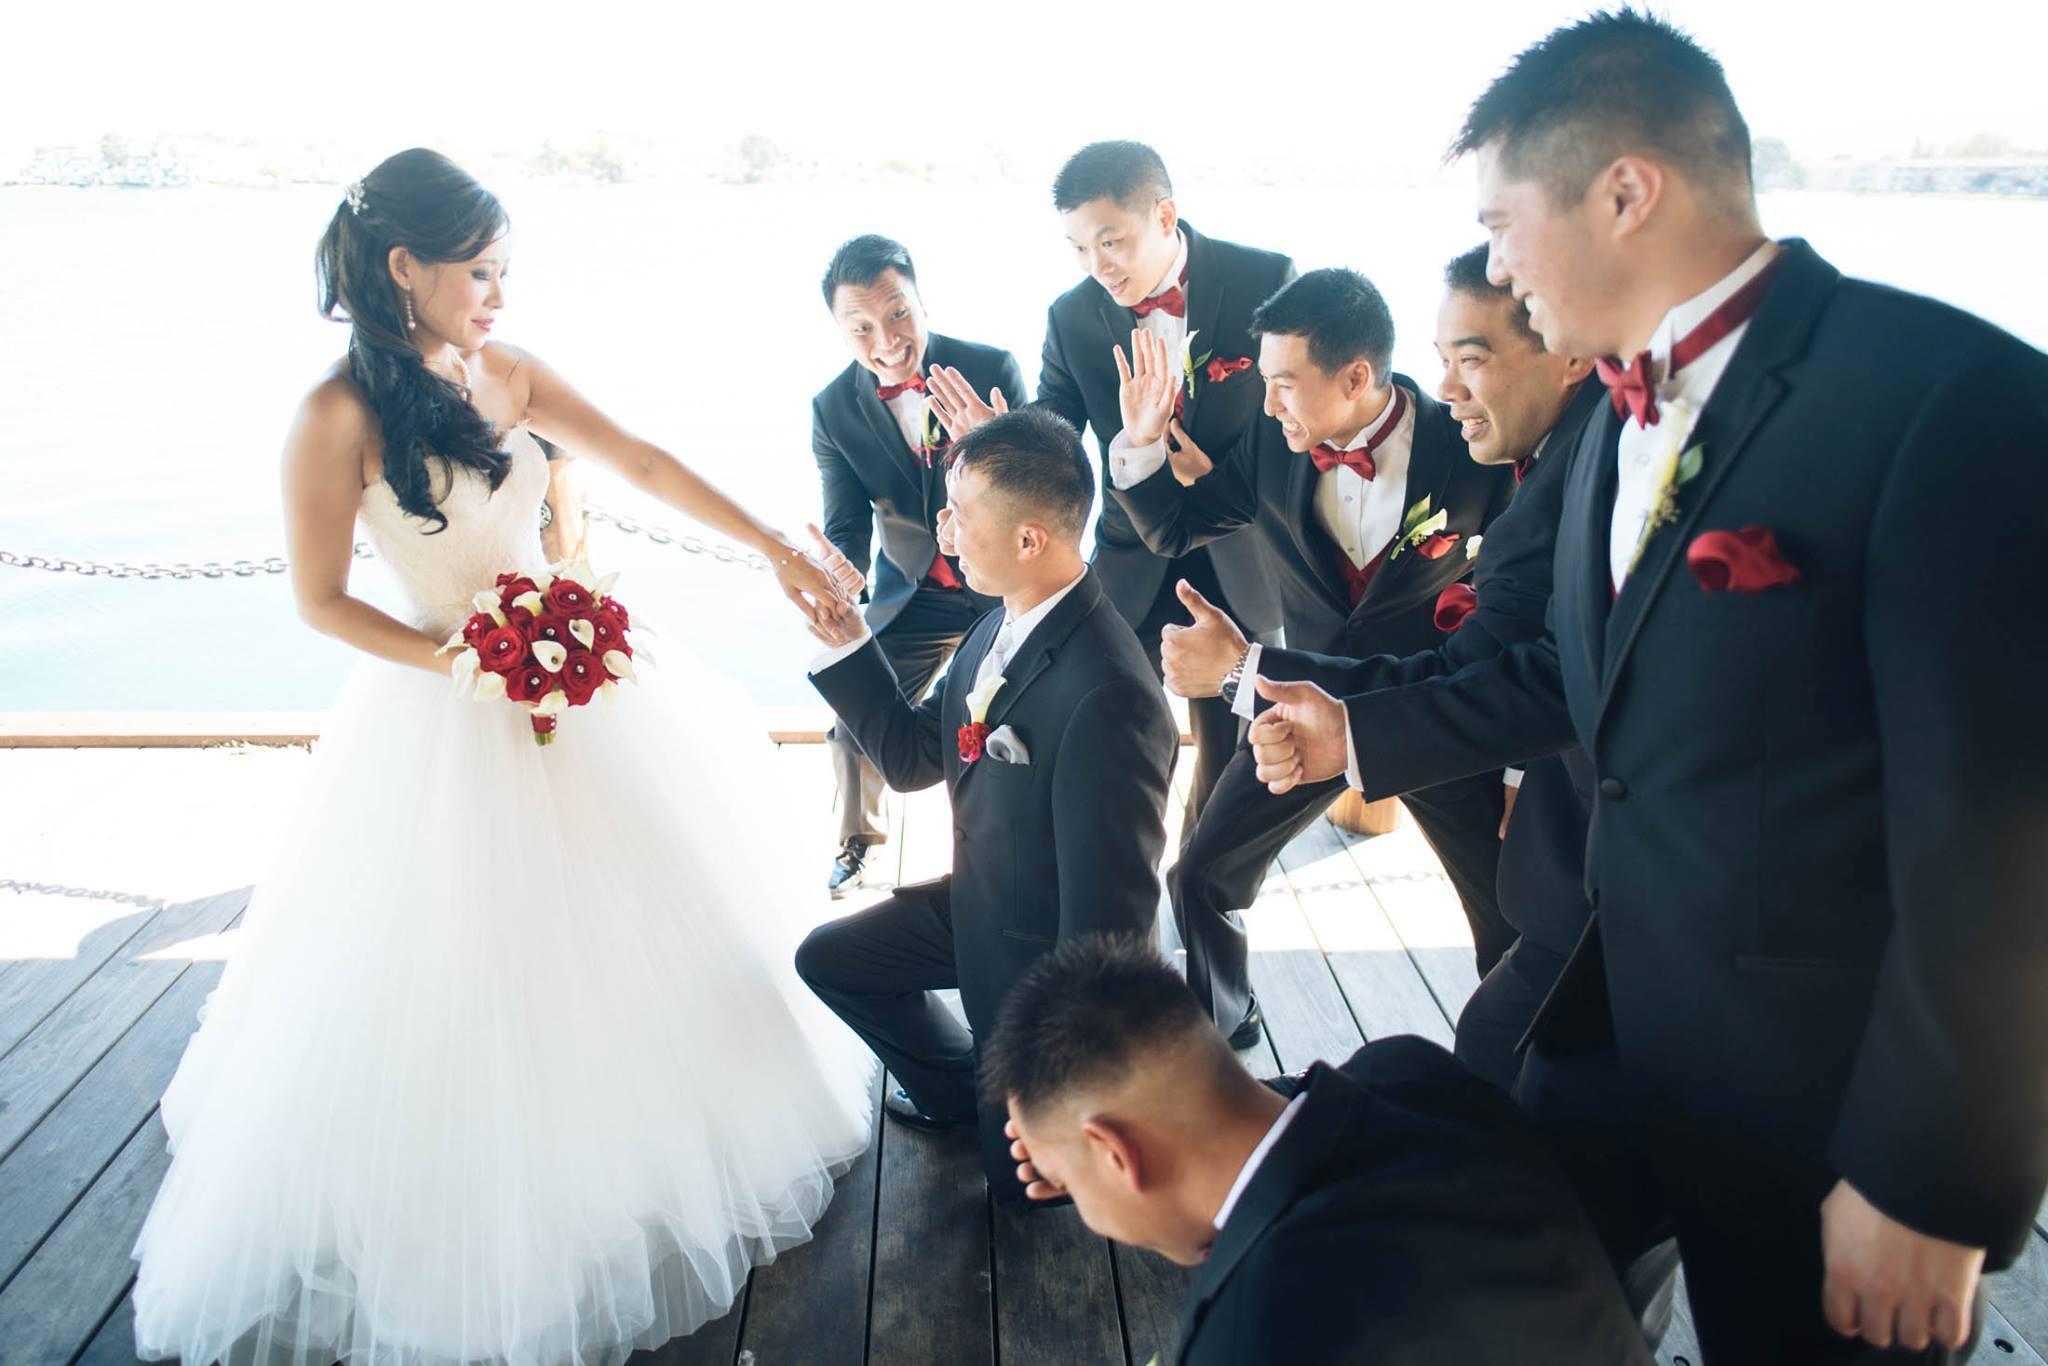 KennyJCStudio - Wedding Day Photography05.jpg